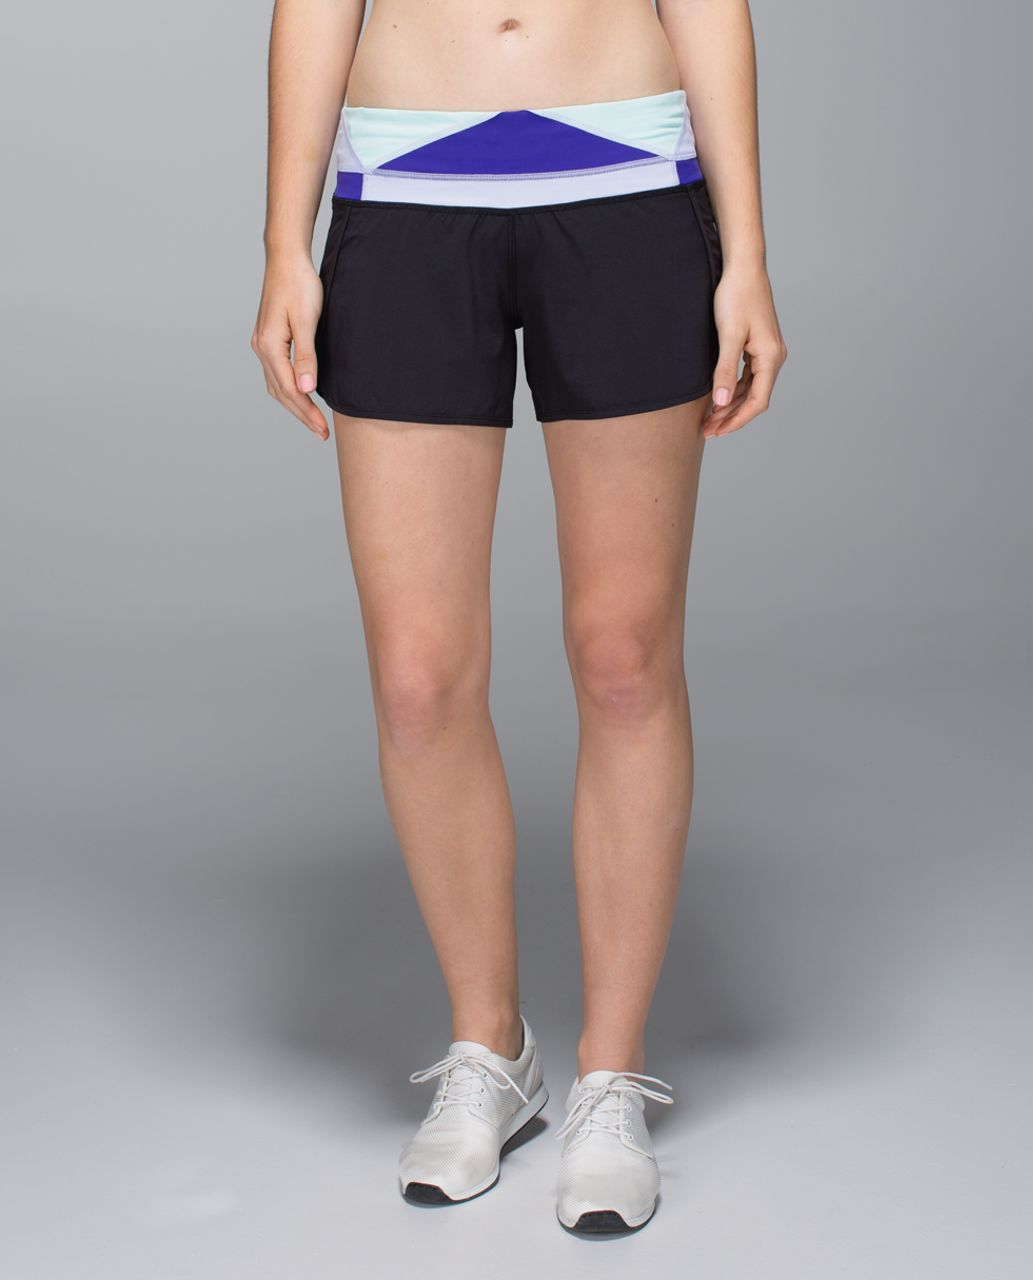 Lululemon Run Times Short *2-way stretch - Black / Su14 Quilt 34